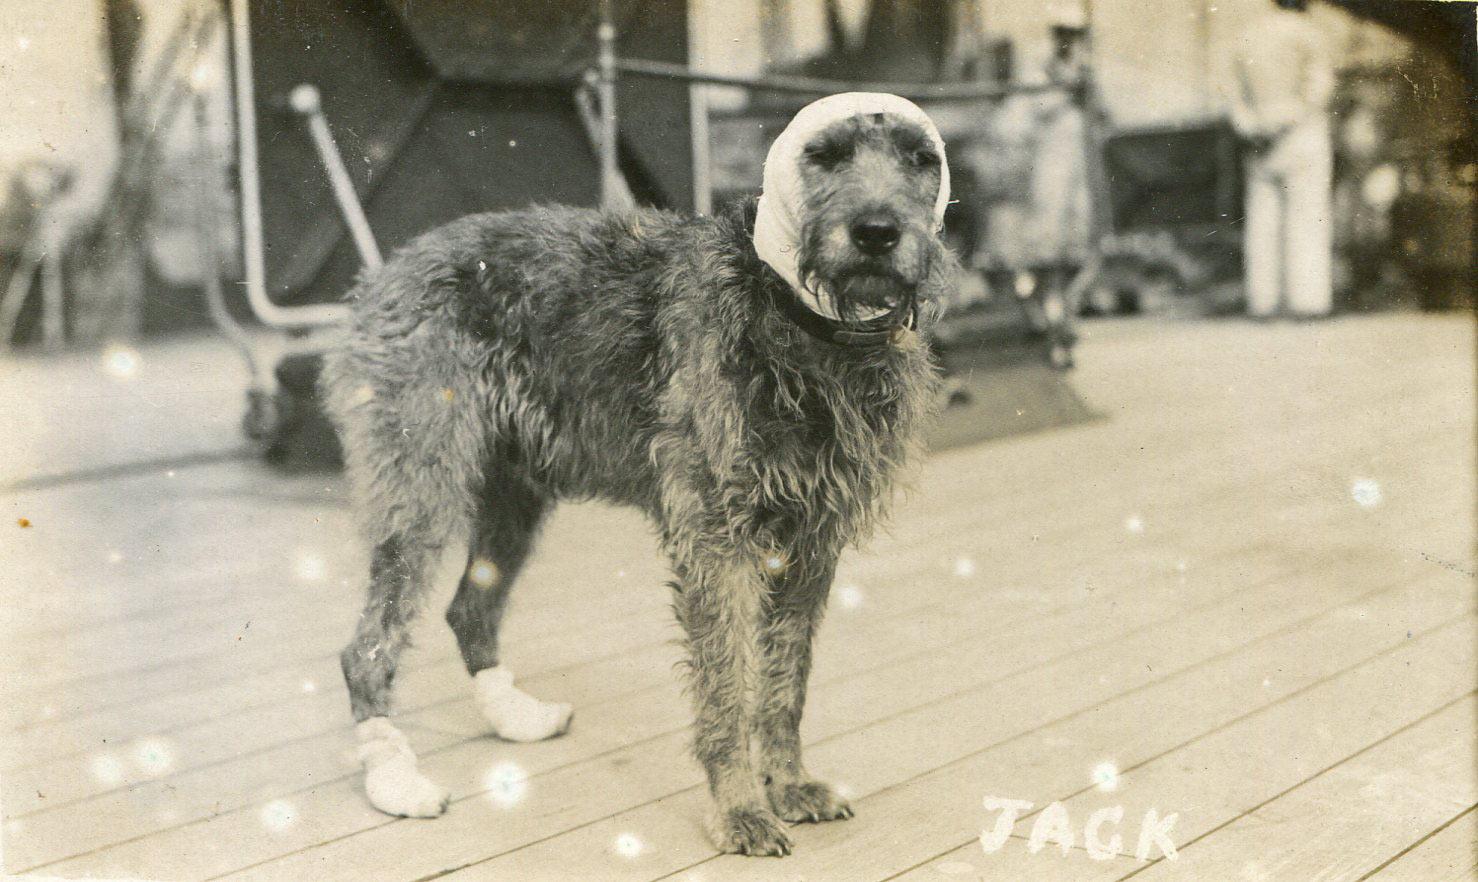 1a-vice-admiral-evan-thomass-dog-jack-wounded-at-battle-of-jutland-31st-may-1916-on-board-hms-barham.jpg